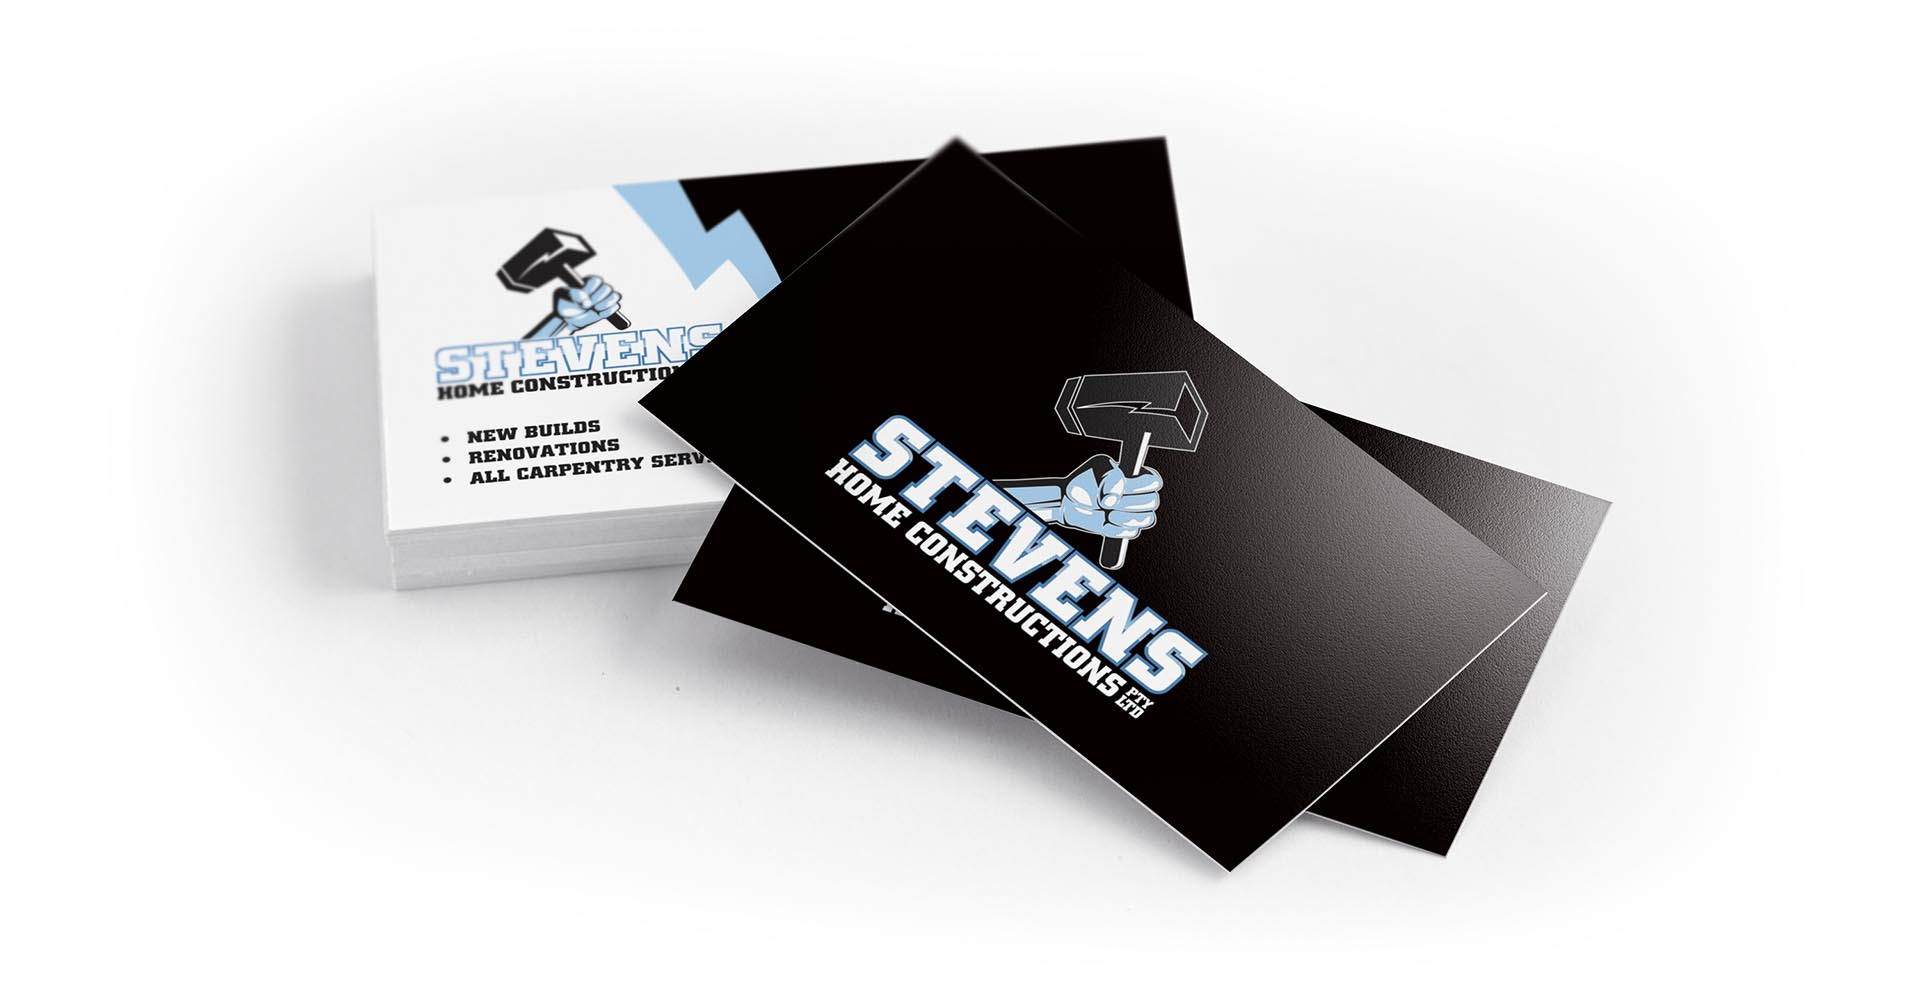 stevens hc project business cards.jpg